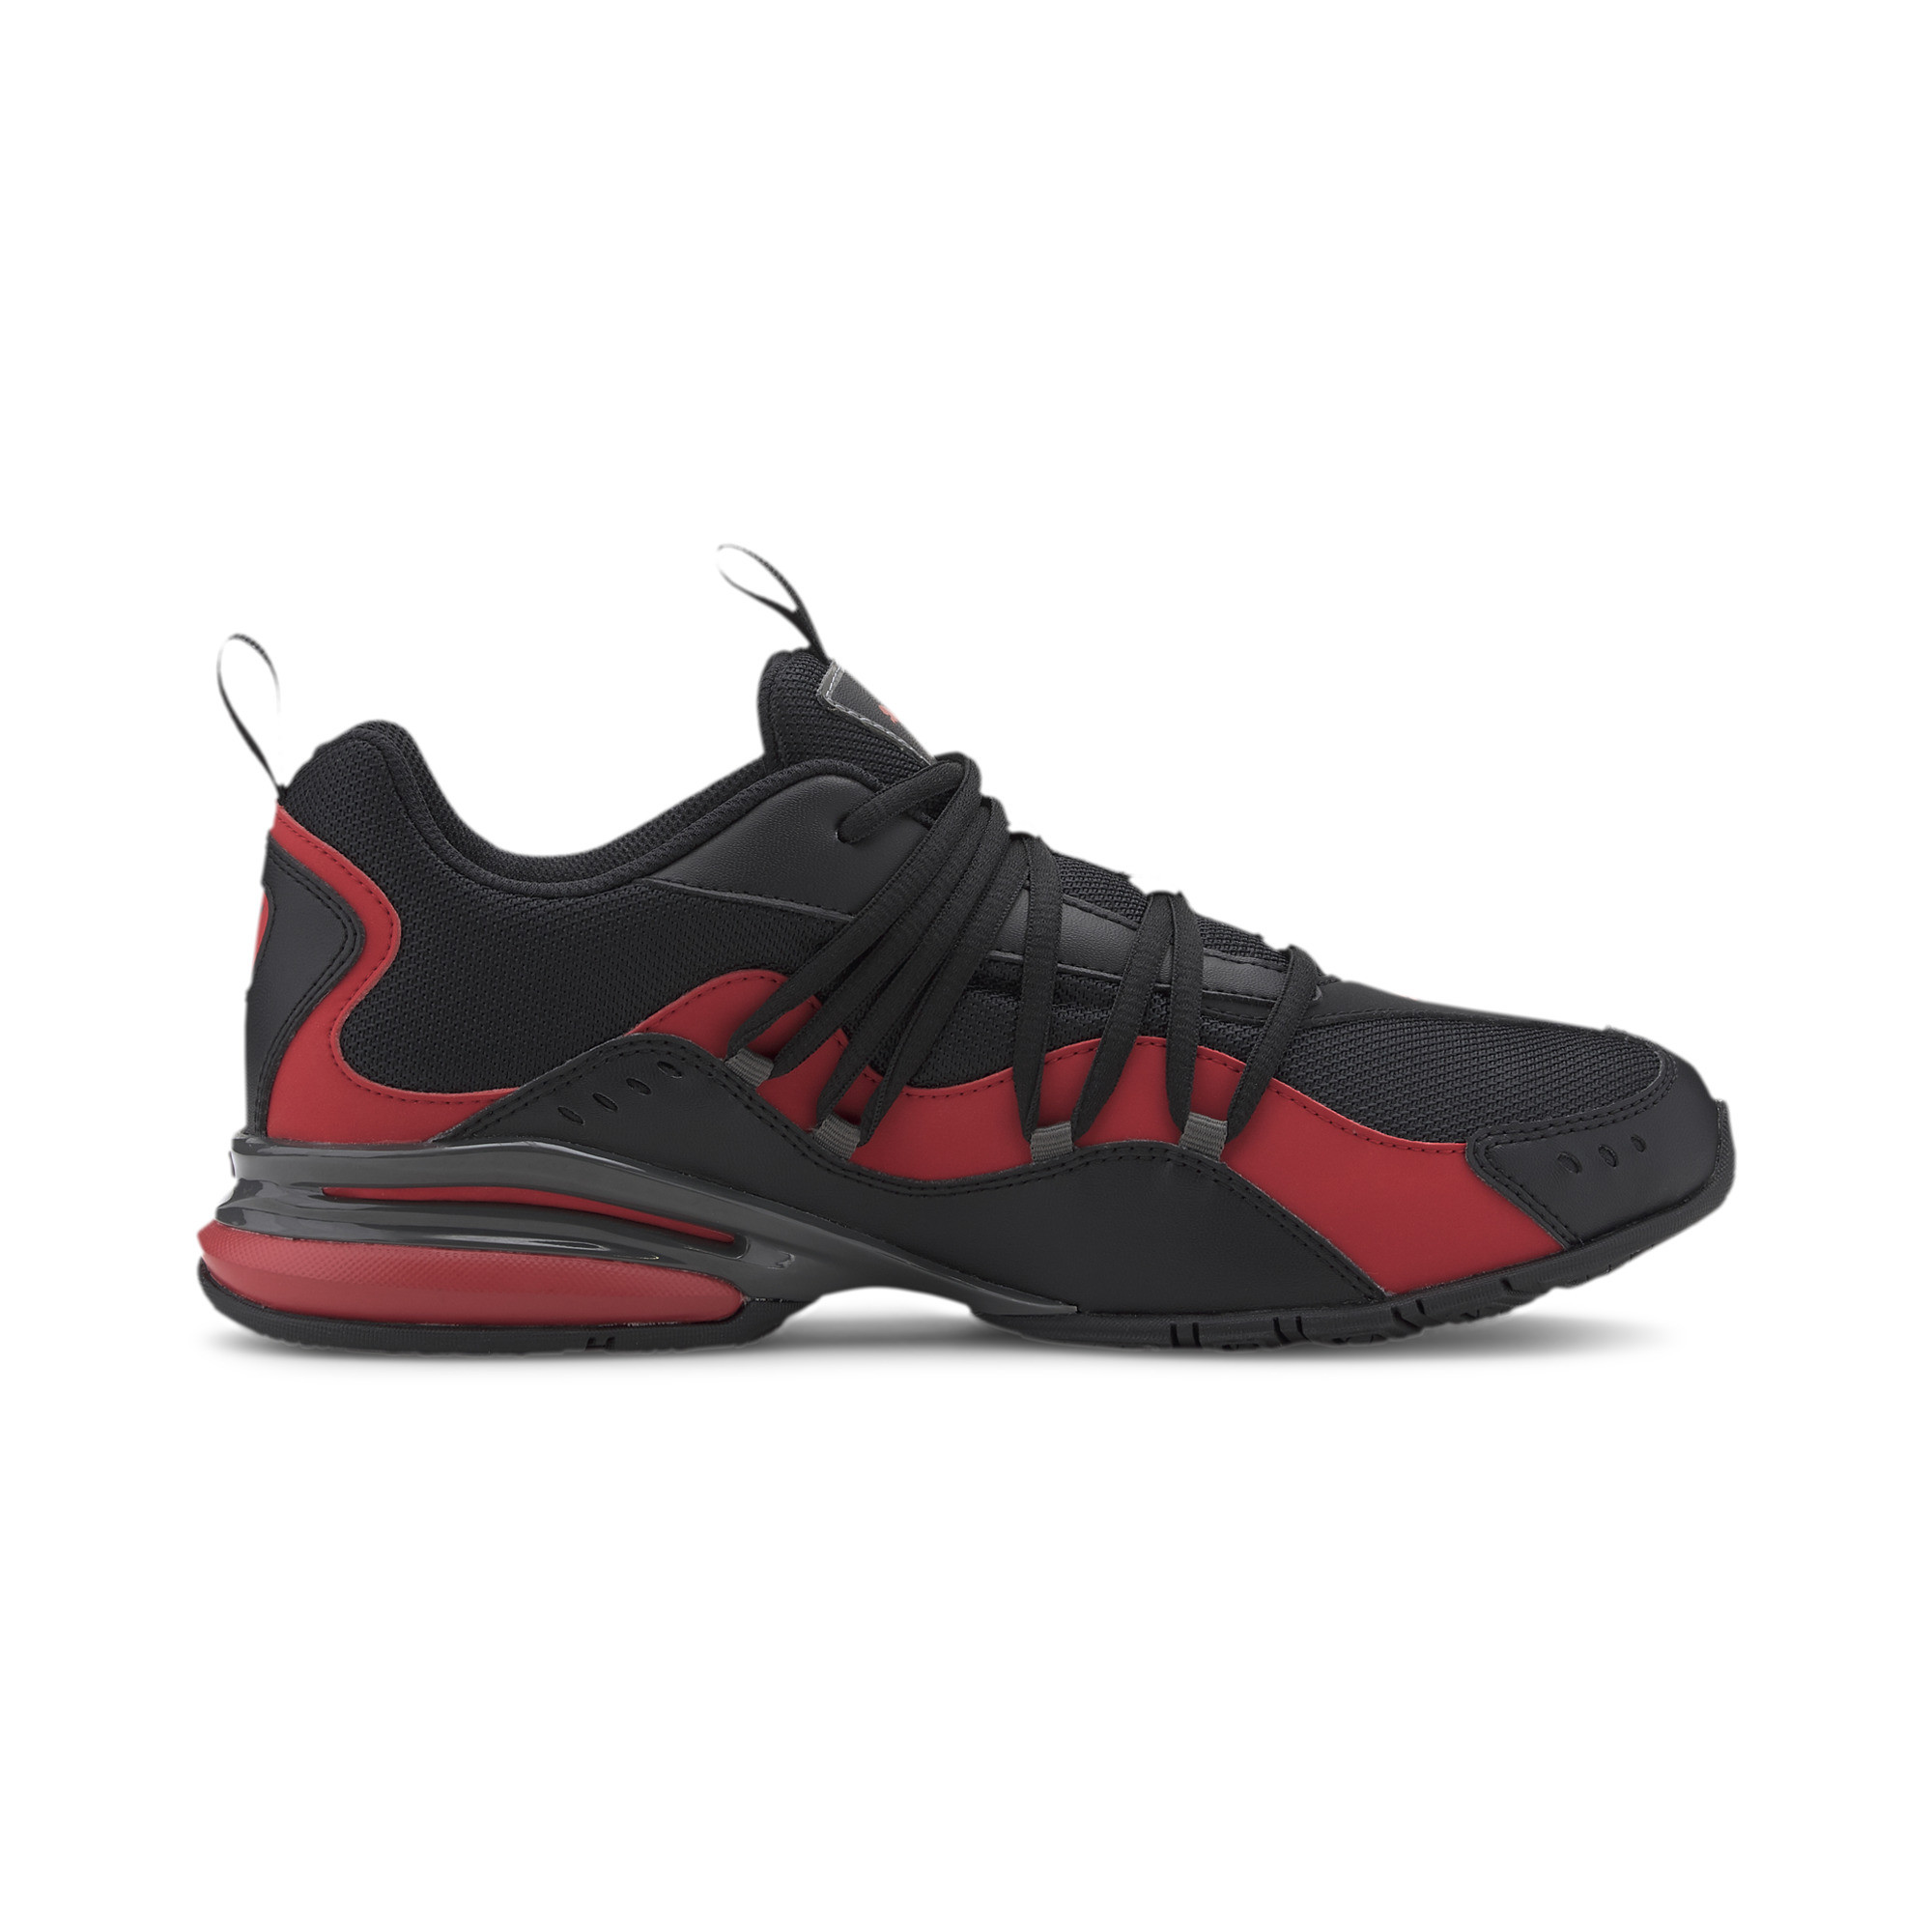 PUMA-Silverion-Men-s-Running-Shoes-Men-Shoe-Running thumbnail 16